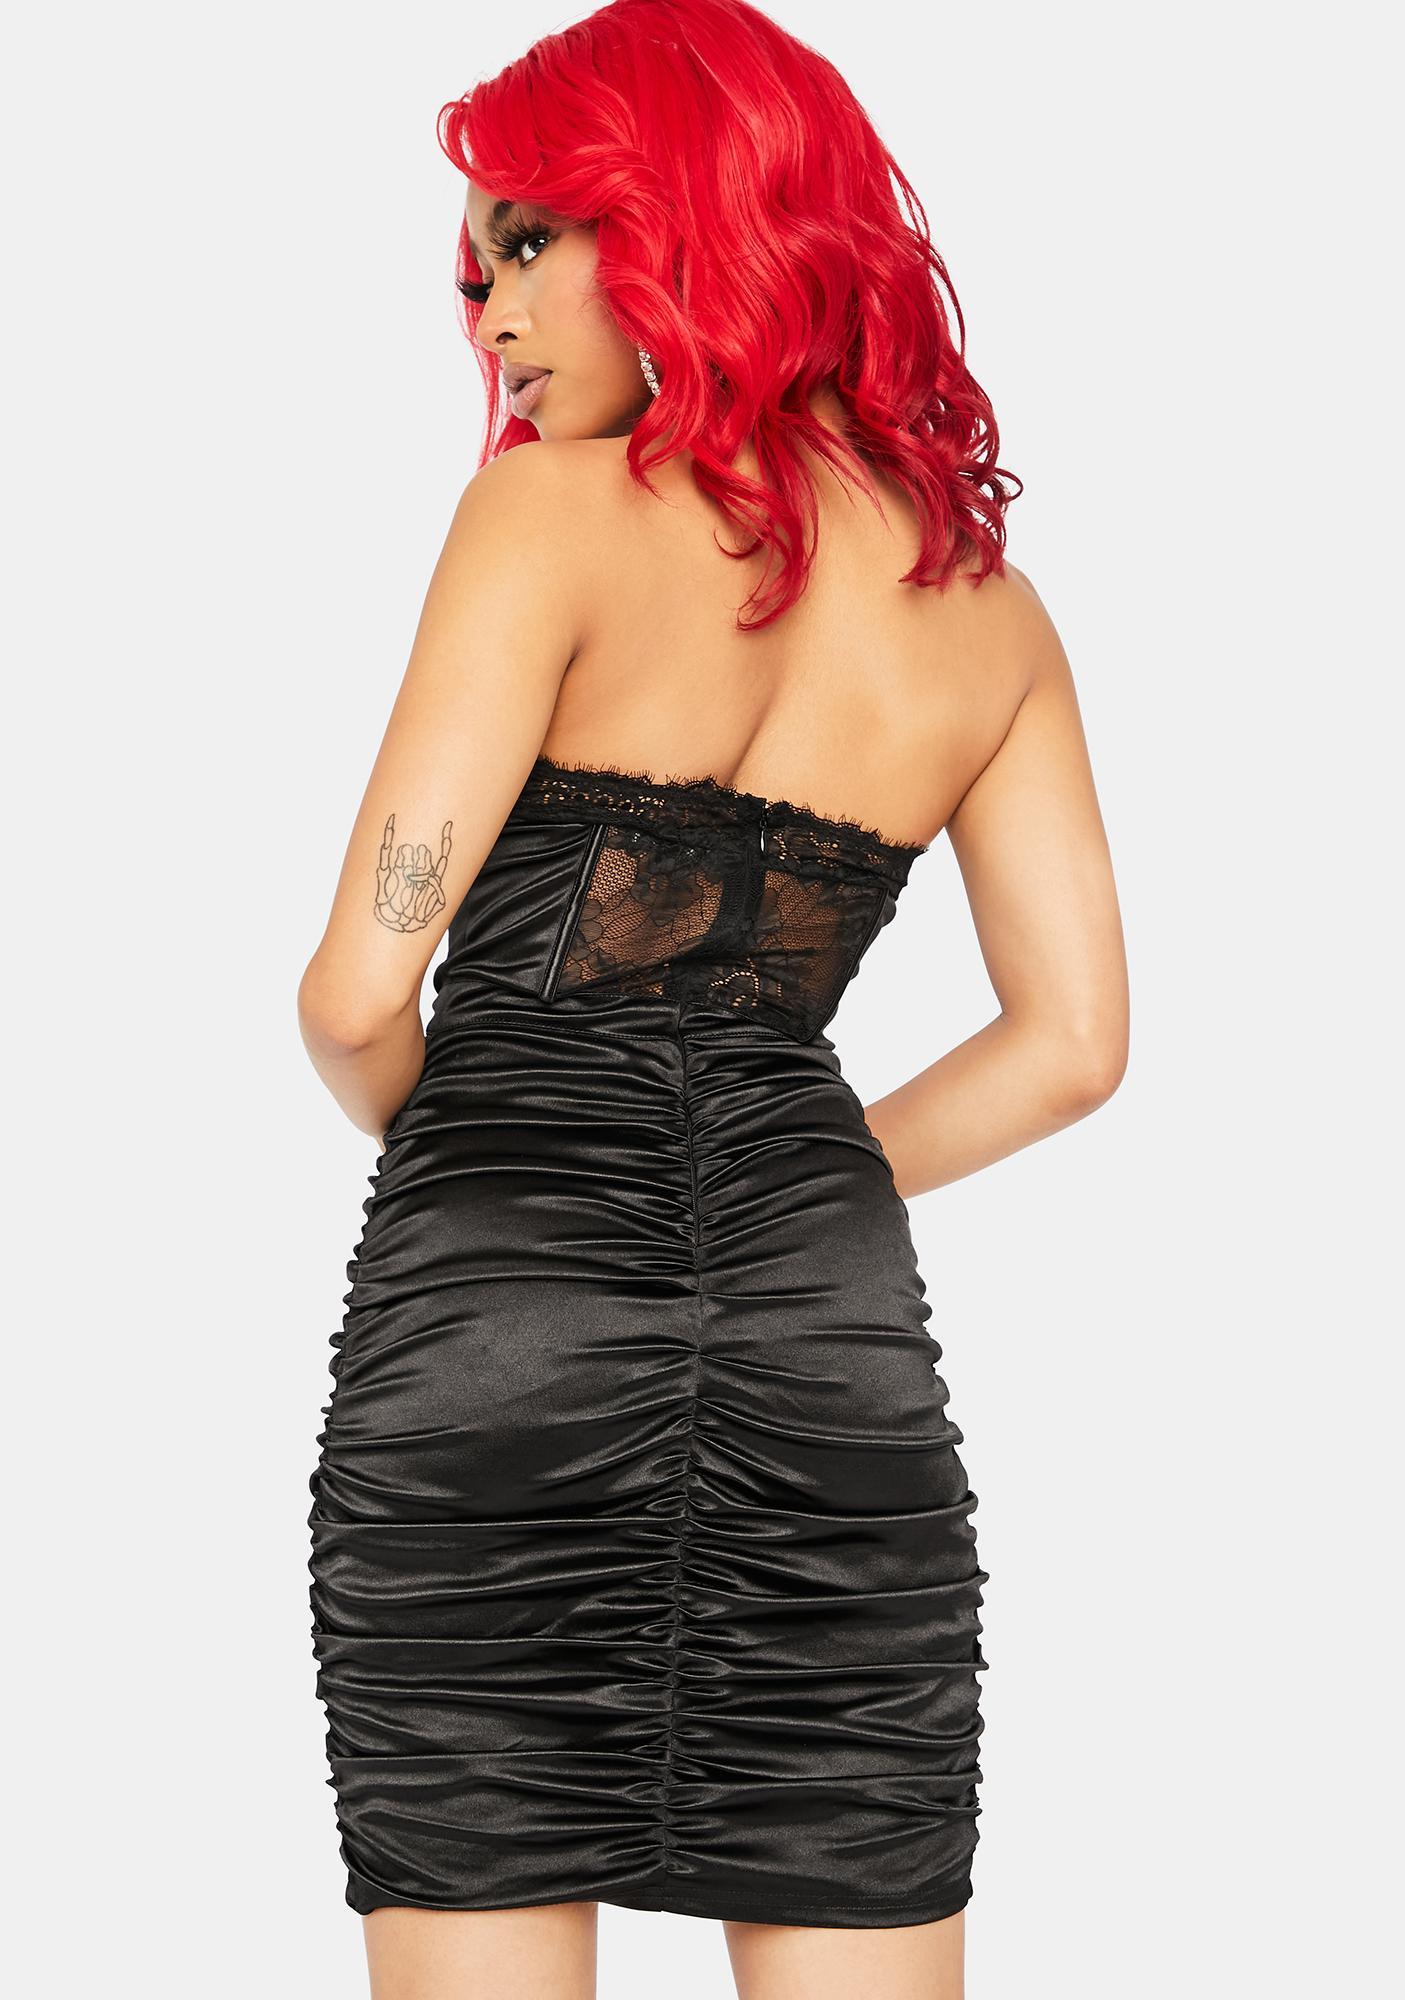 Body Language Ruched Dress